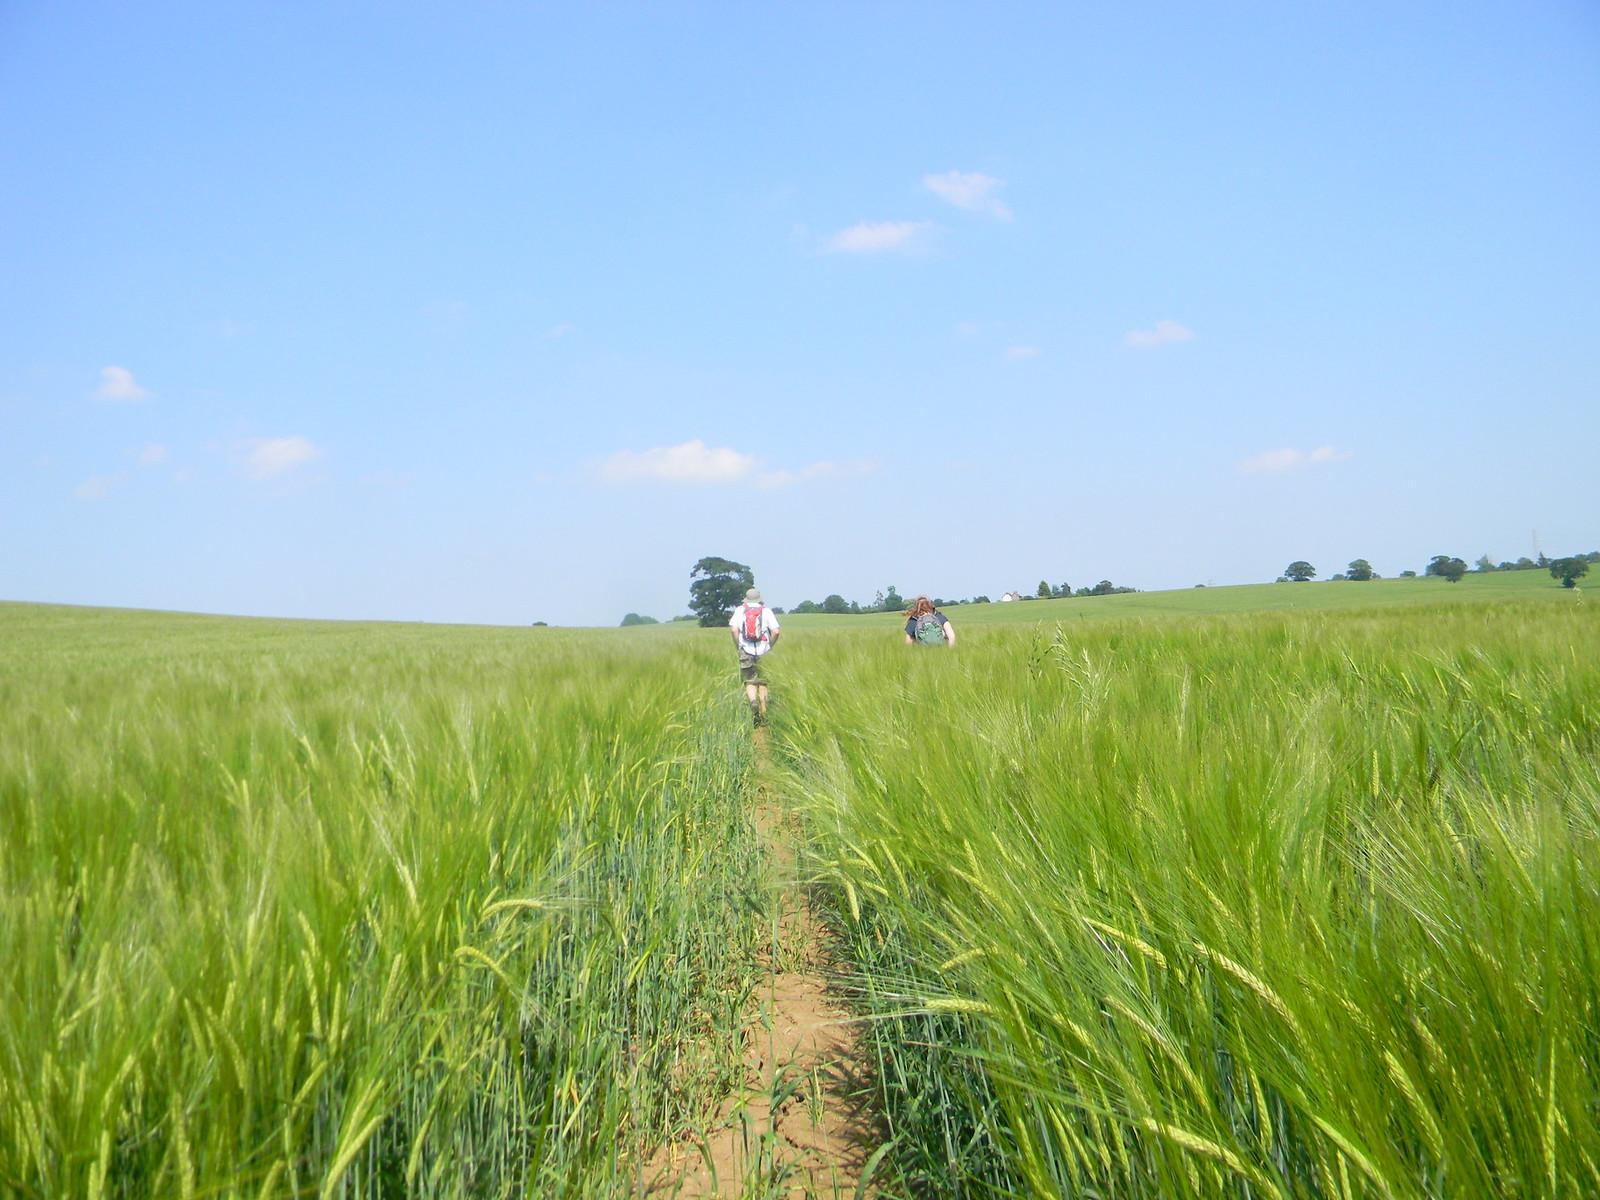 Barley field South Woodham Ferrers to North Fambridge